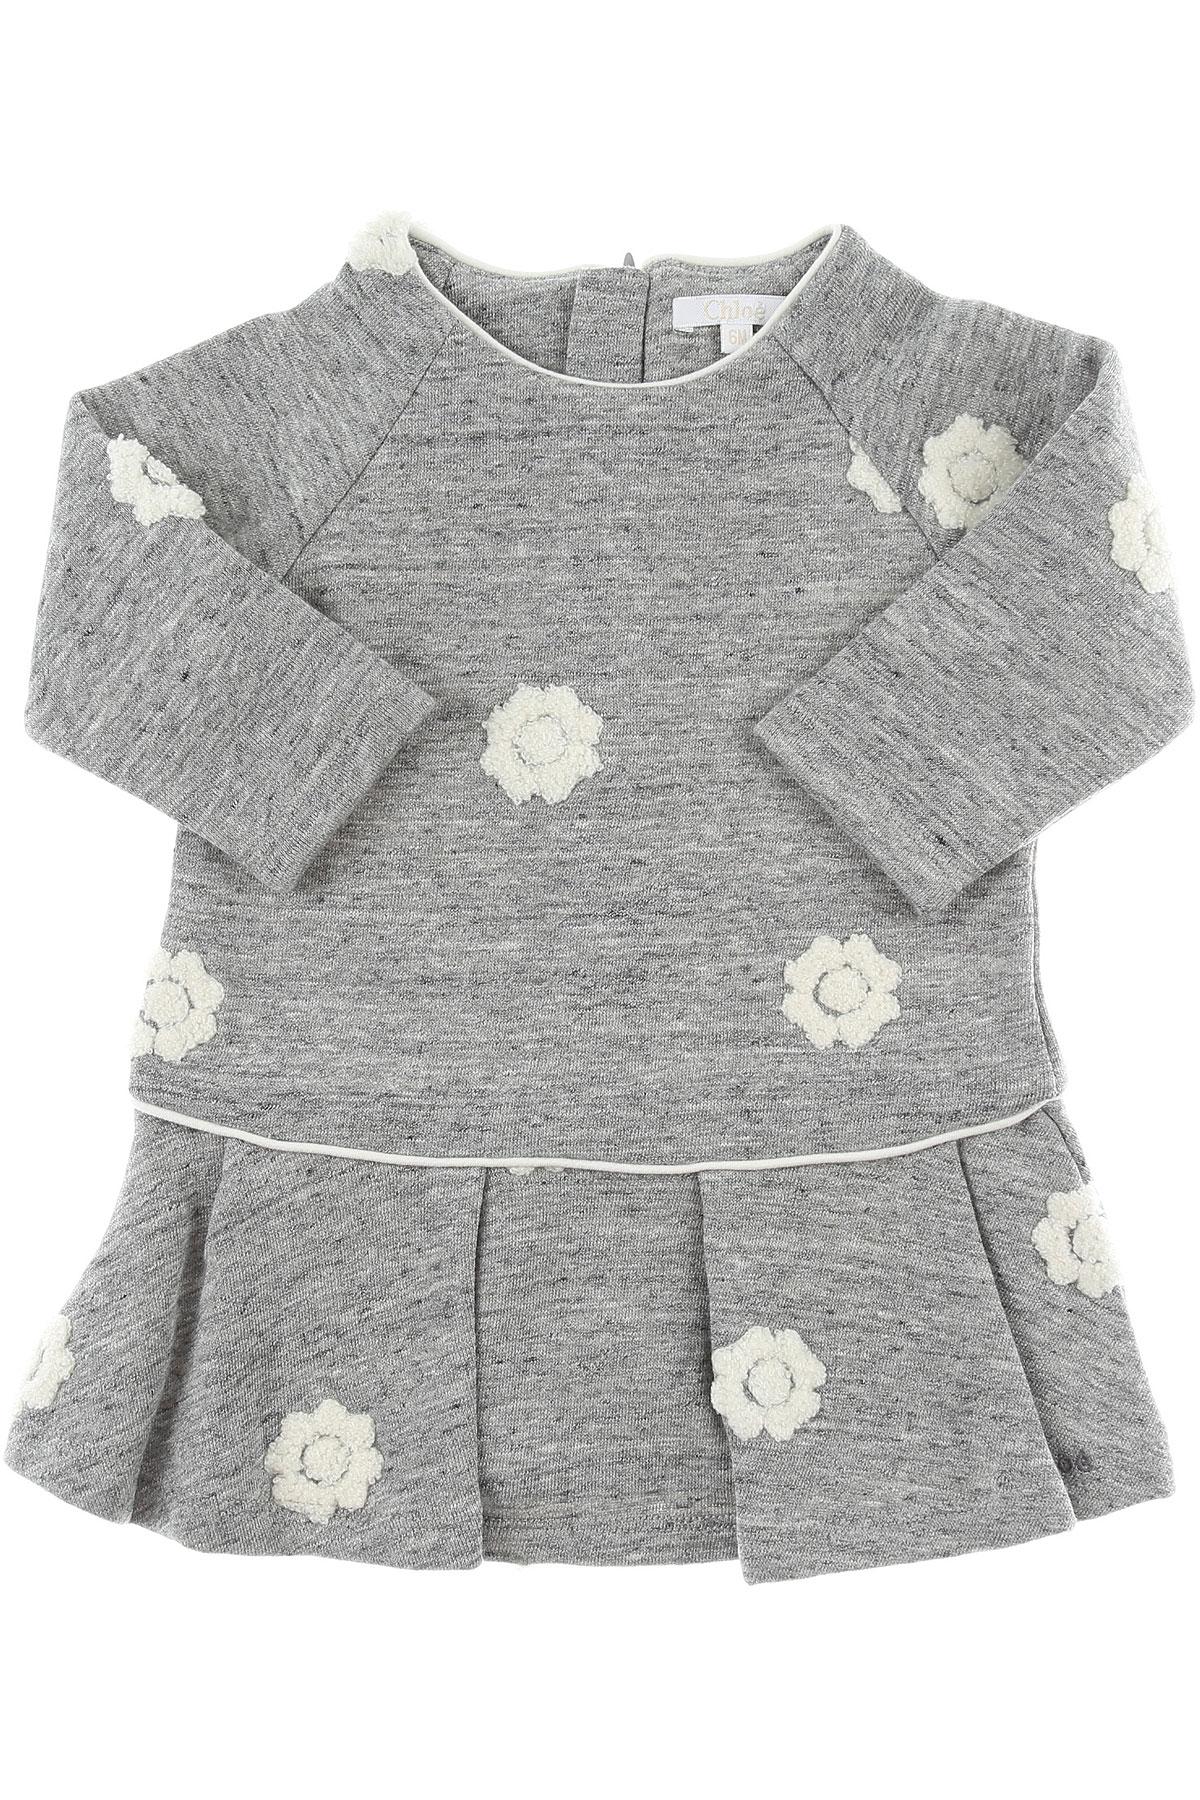 Image of Chloe Baby Dress for Girls, Grey, Cotton, 2017, 12M 18M 2Y 3Y 6M 9M